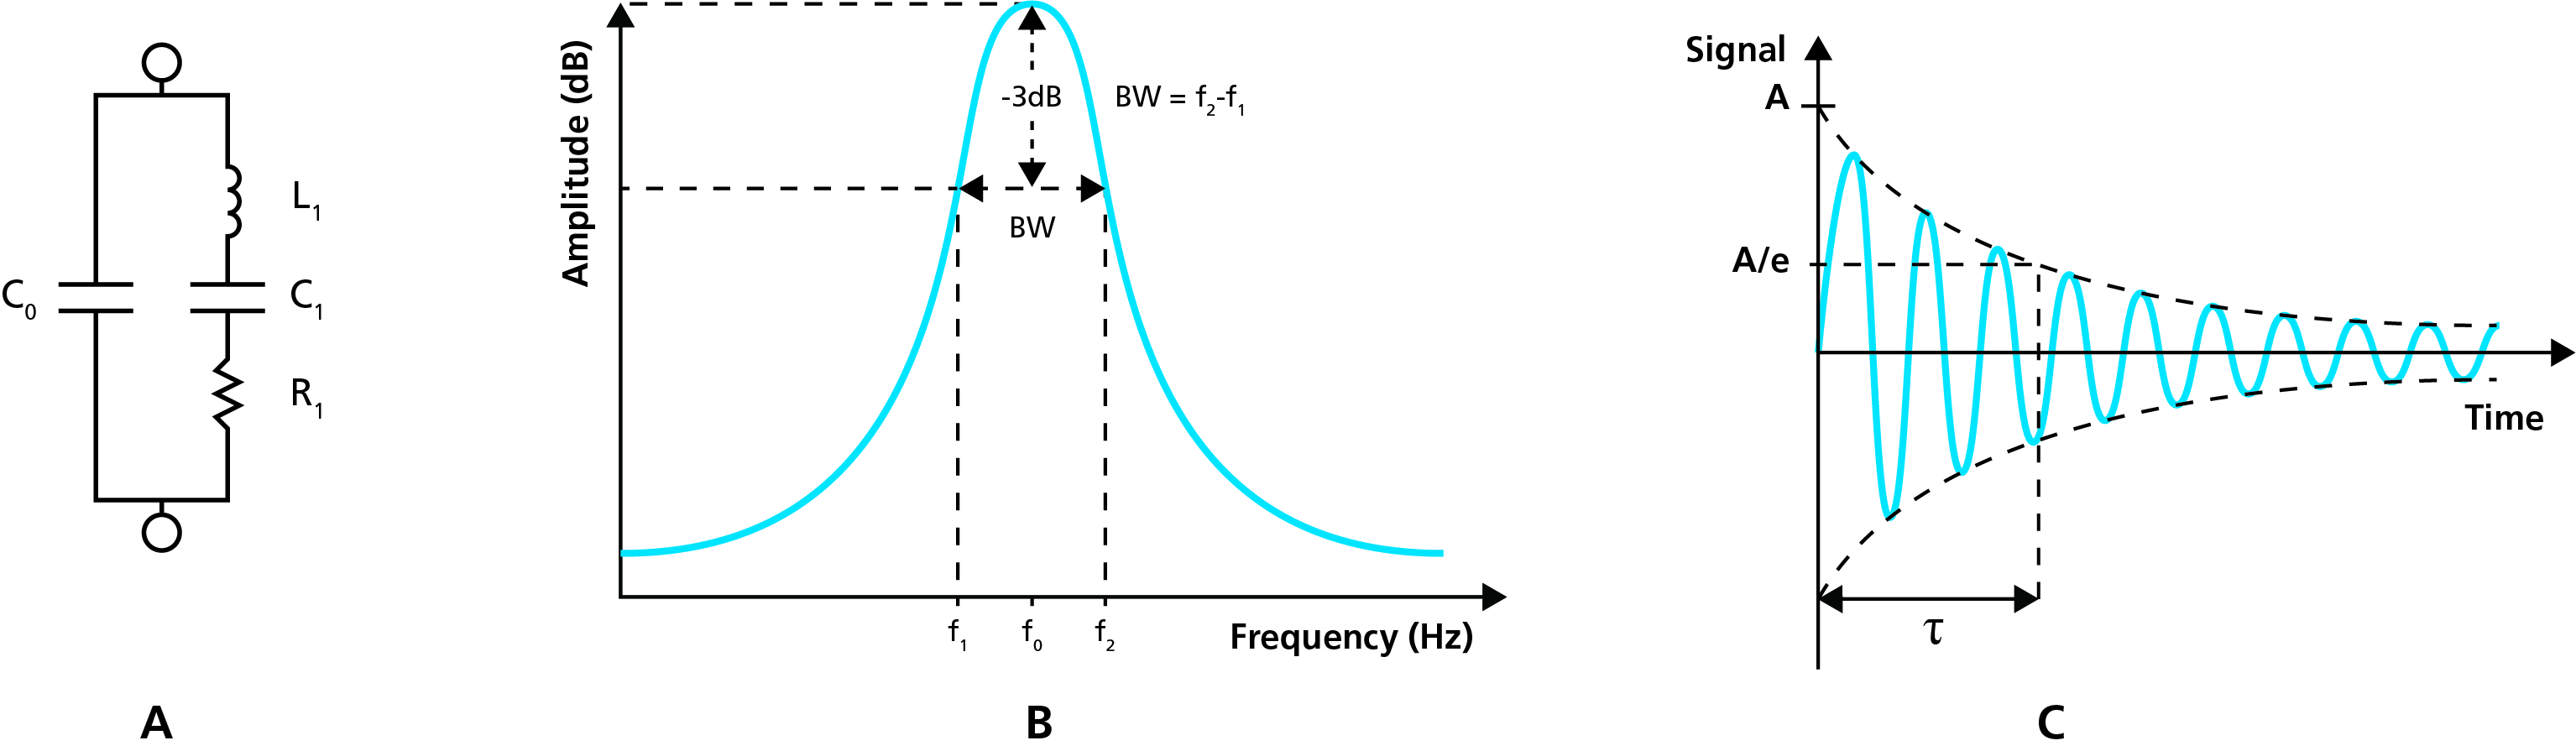 Equivalent circuit resonace peak decaying wave